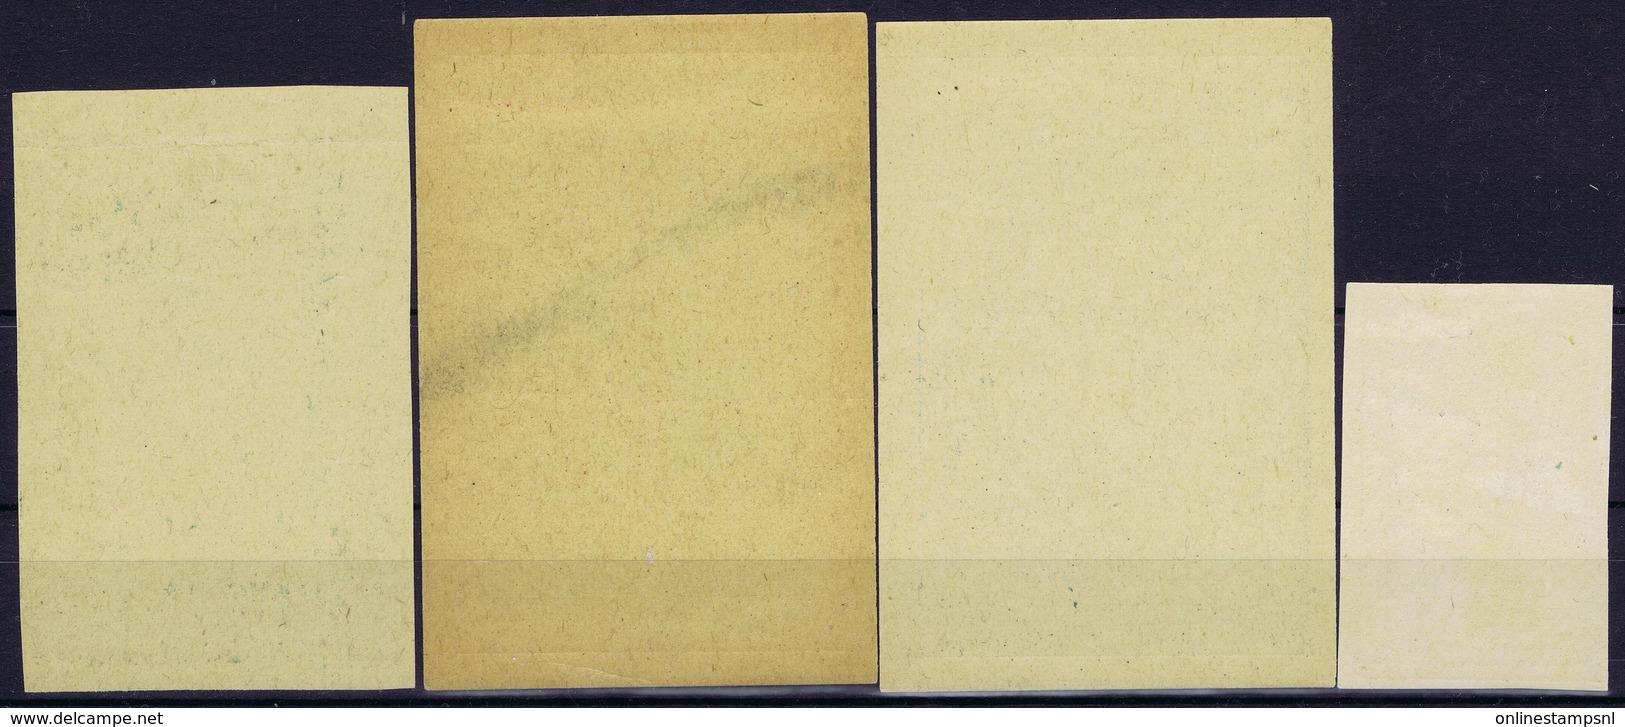 Italy  Esperimenti D'Aviazione 1910 Bologna - Piazza D'Armi  4 Pieces - 1900-44 Victor Emmanuel III